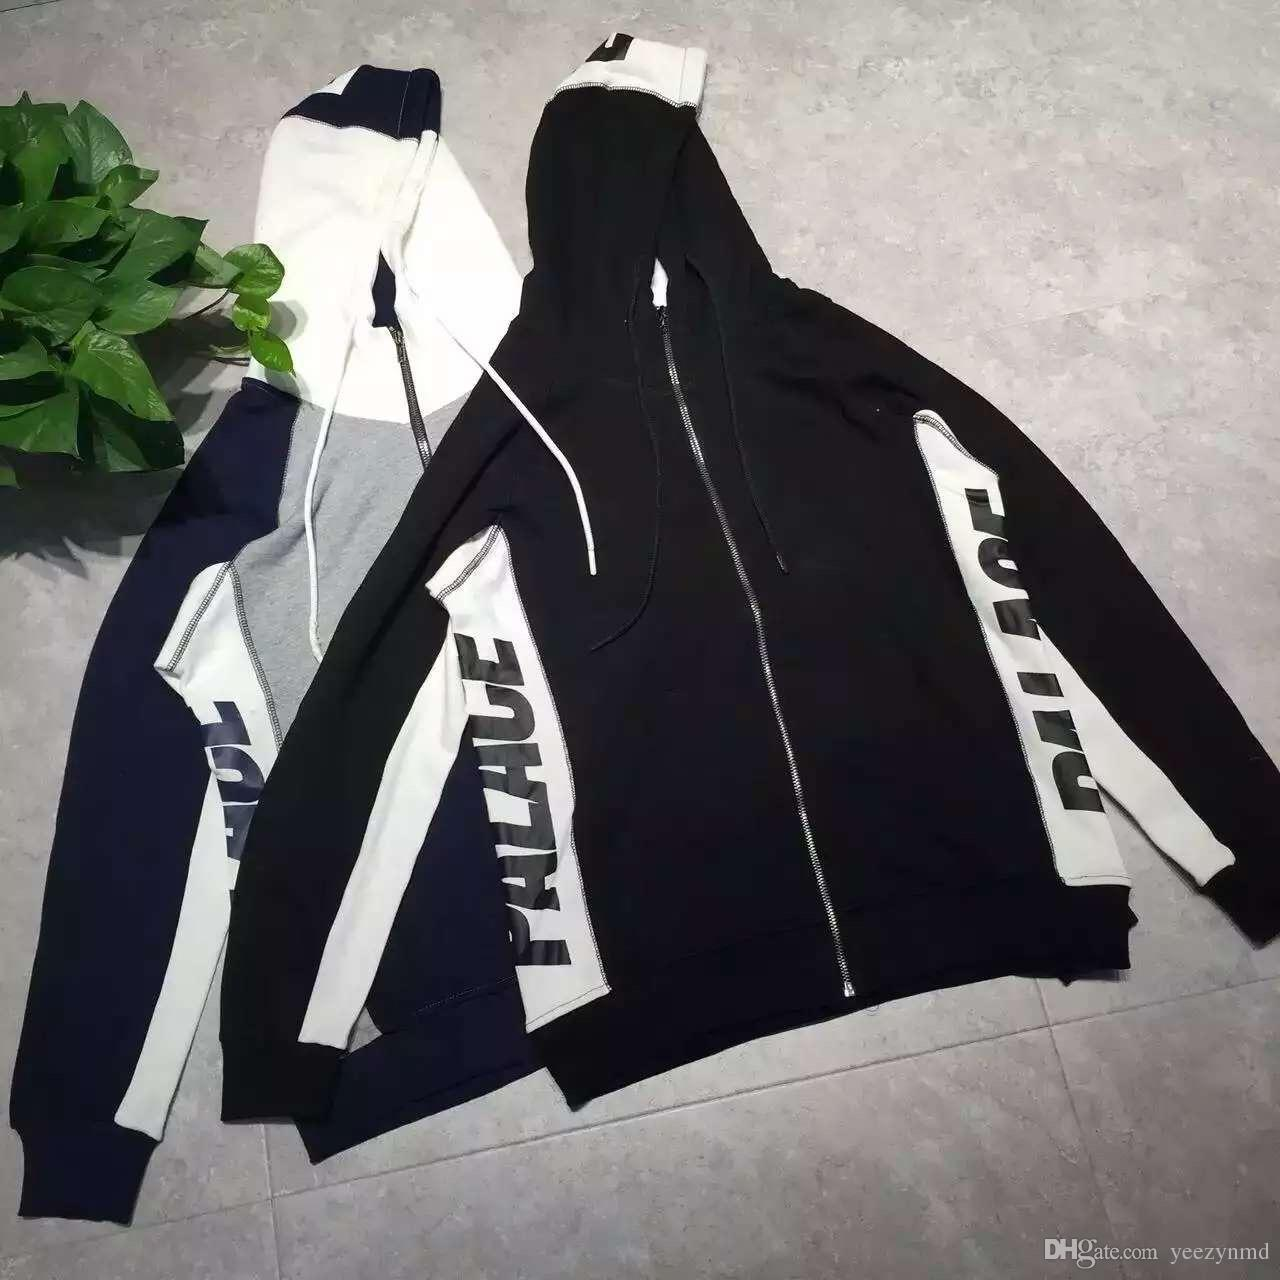 Foison Palace Hoodie Fashion Zip Design Vertical Tri